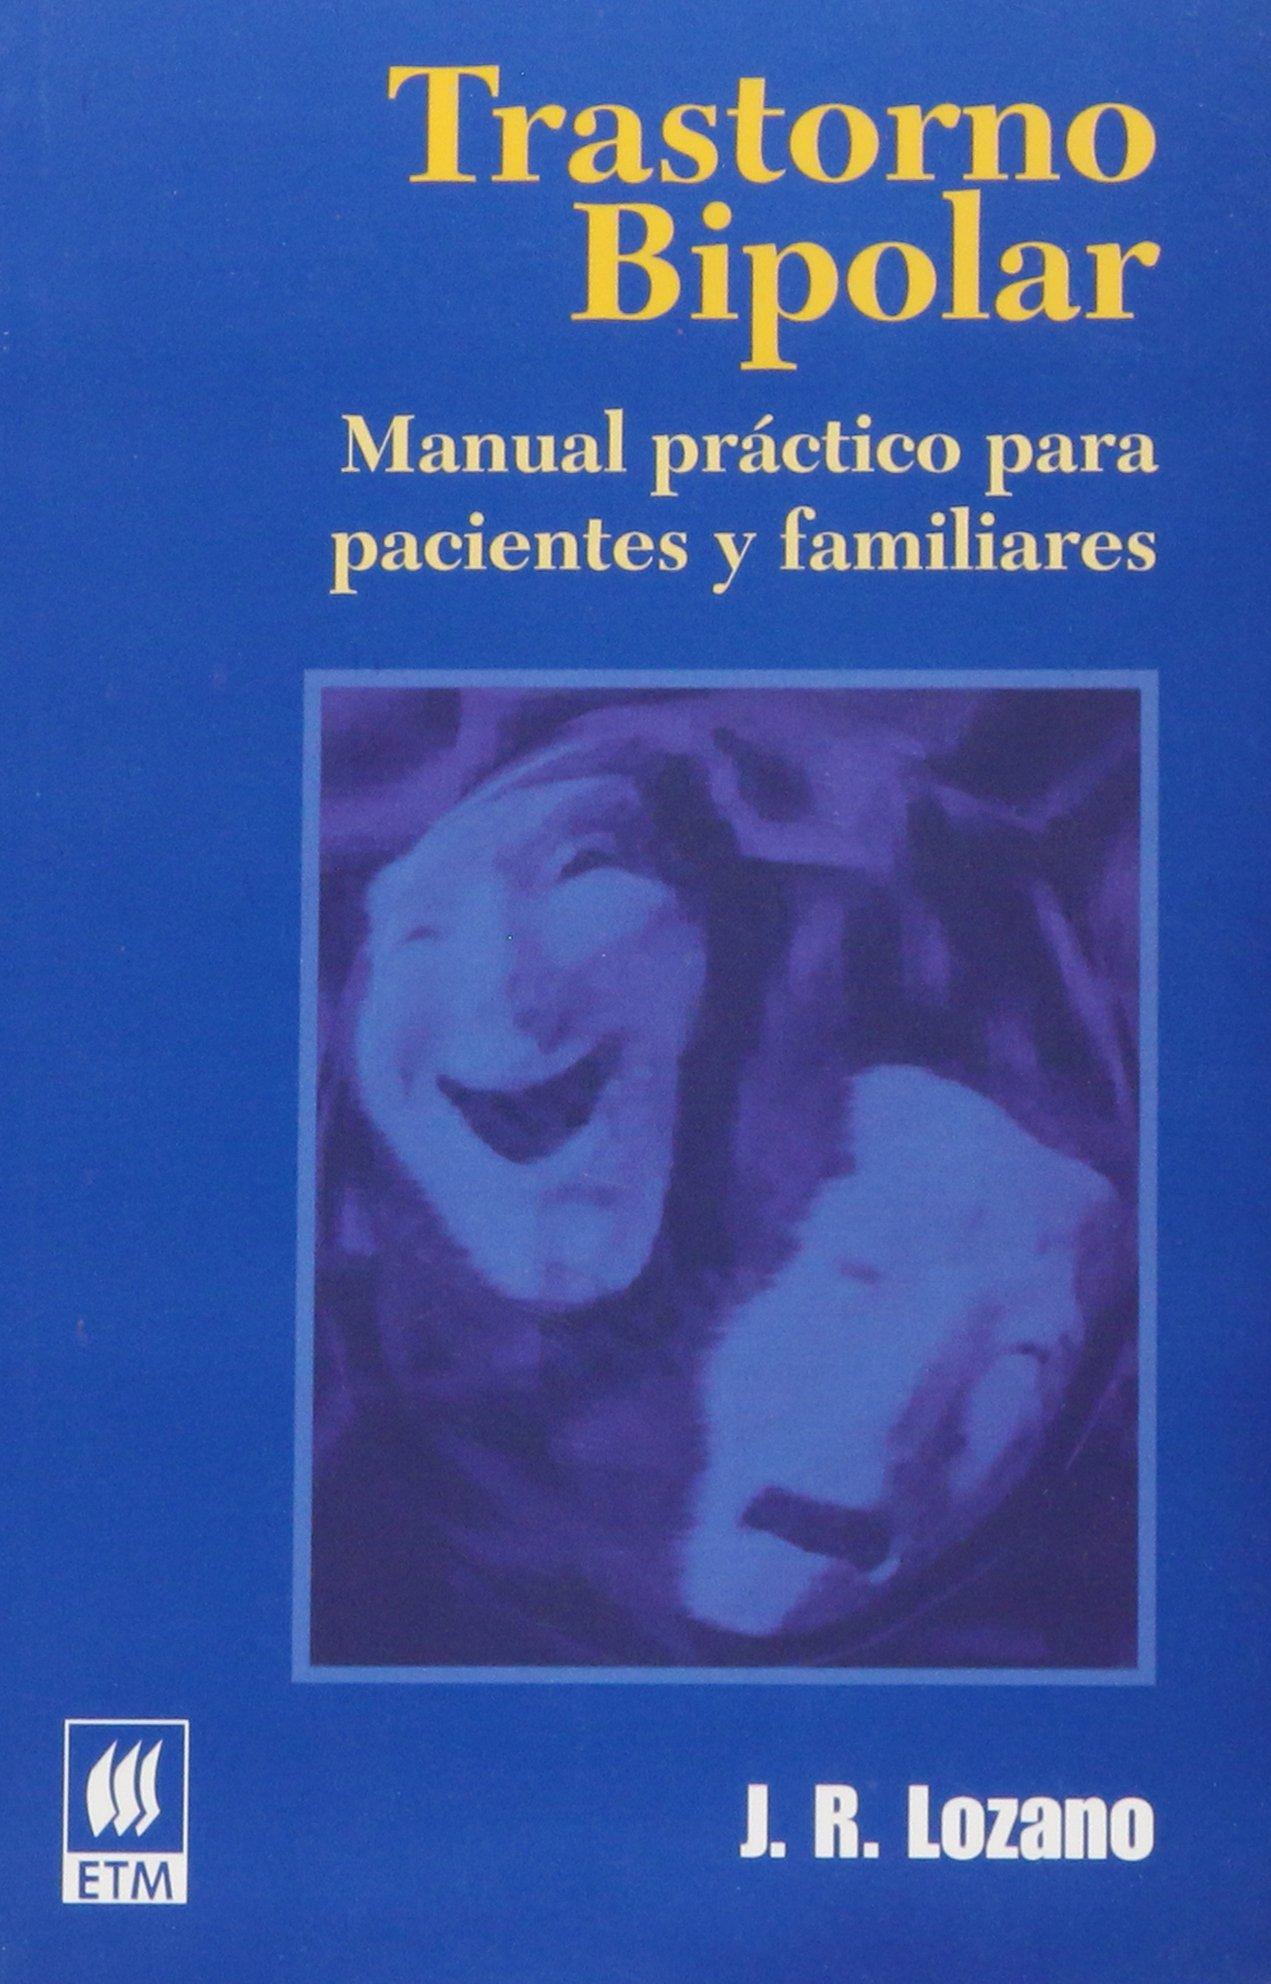 Download Trastorno bipolar/ Bipolar Disorder: Manual practico para pacientes y familiares/ Practical Manual for Patients and Families (Spanish Edition) pdf epub